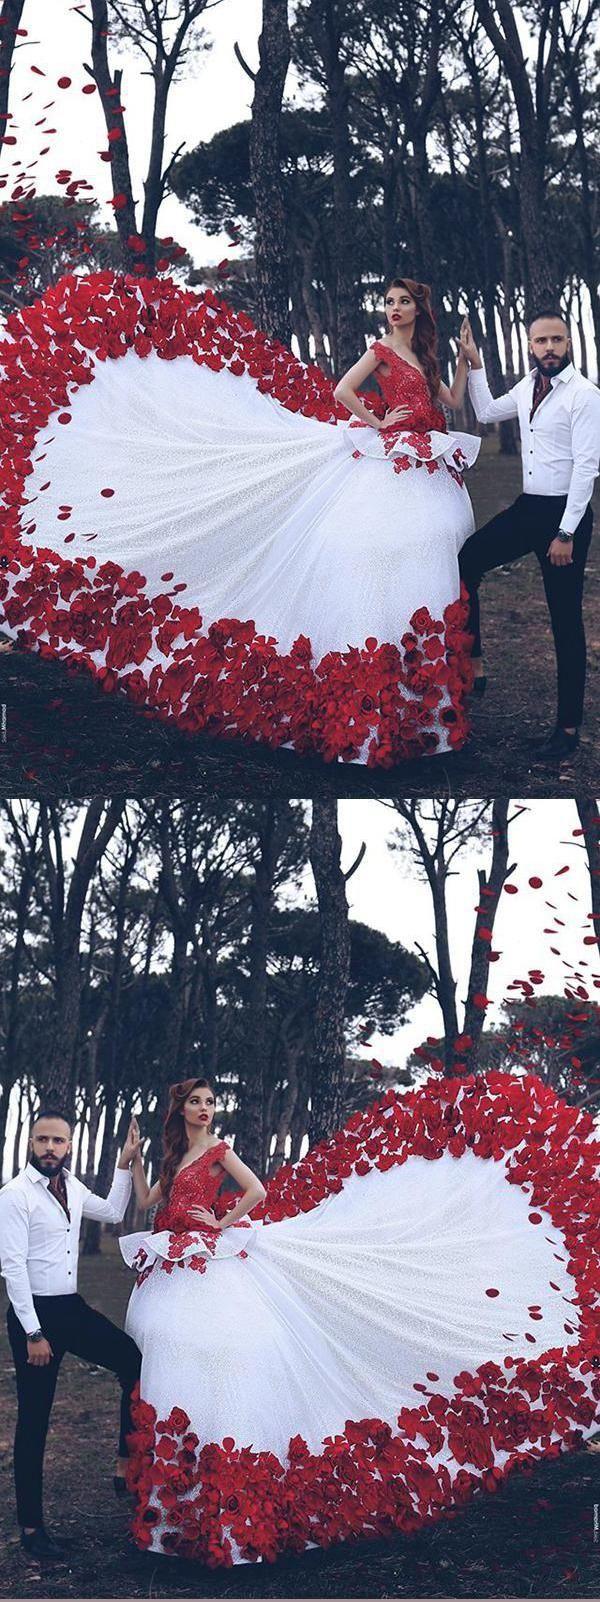 Lace Wedding Dresses White Lace Wedding Dresses Wedding Dresses Red Vintage Wedding Dres Red Wedding Dresses White Lace Wedding Dress Red Lace Wedding Dress [ 1602 x 600 Pixel ]